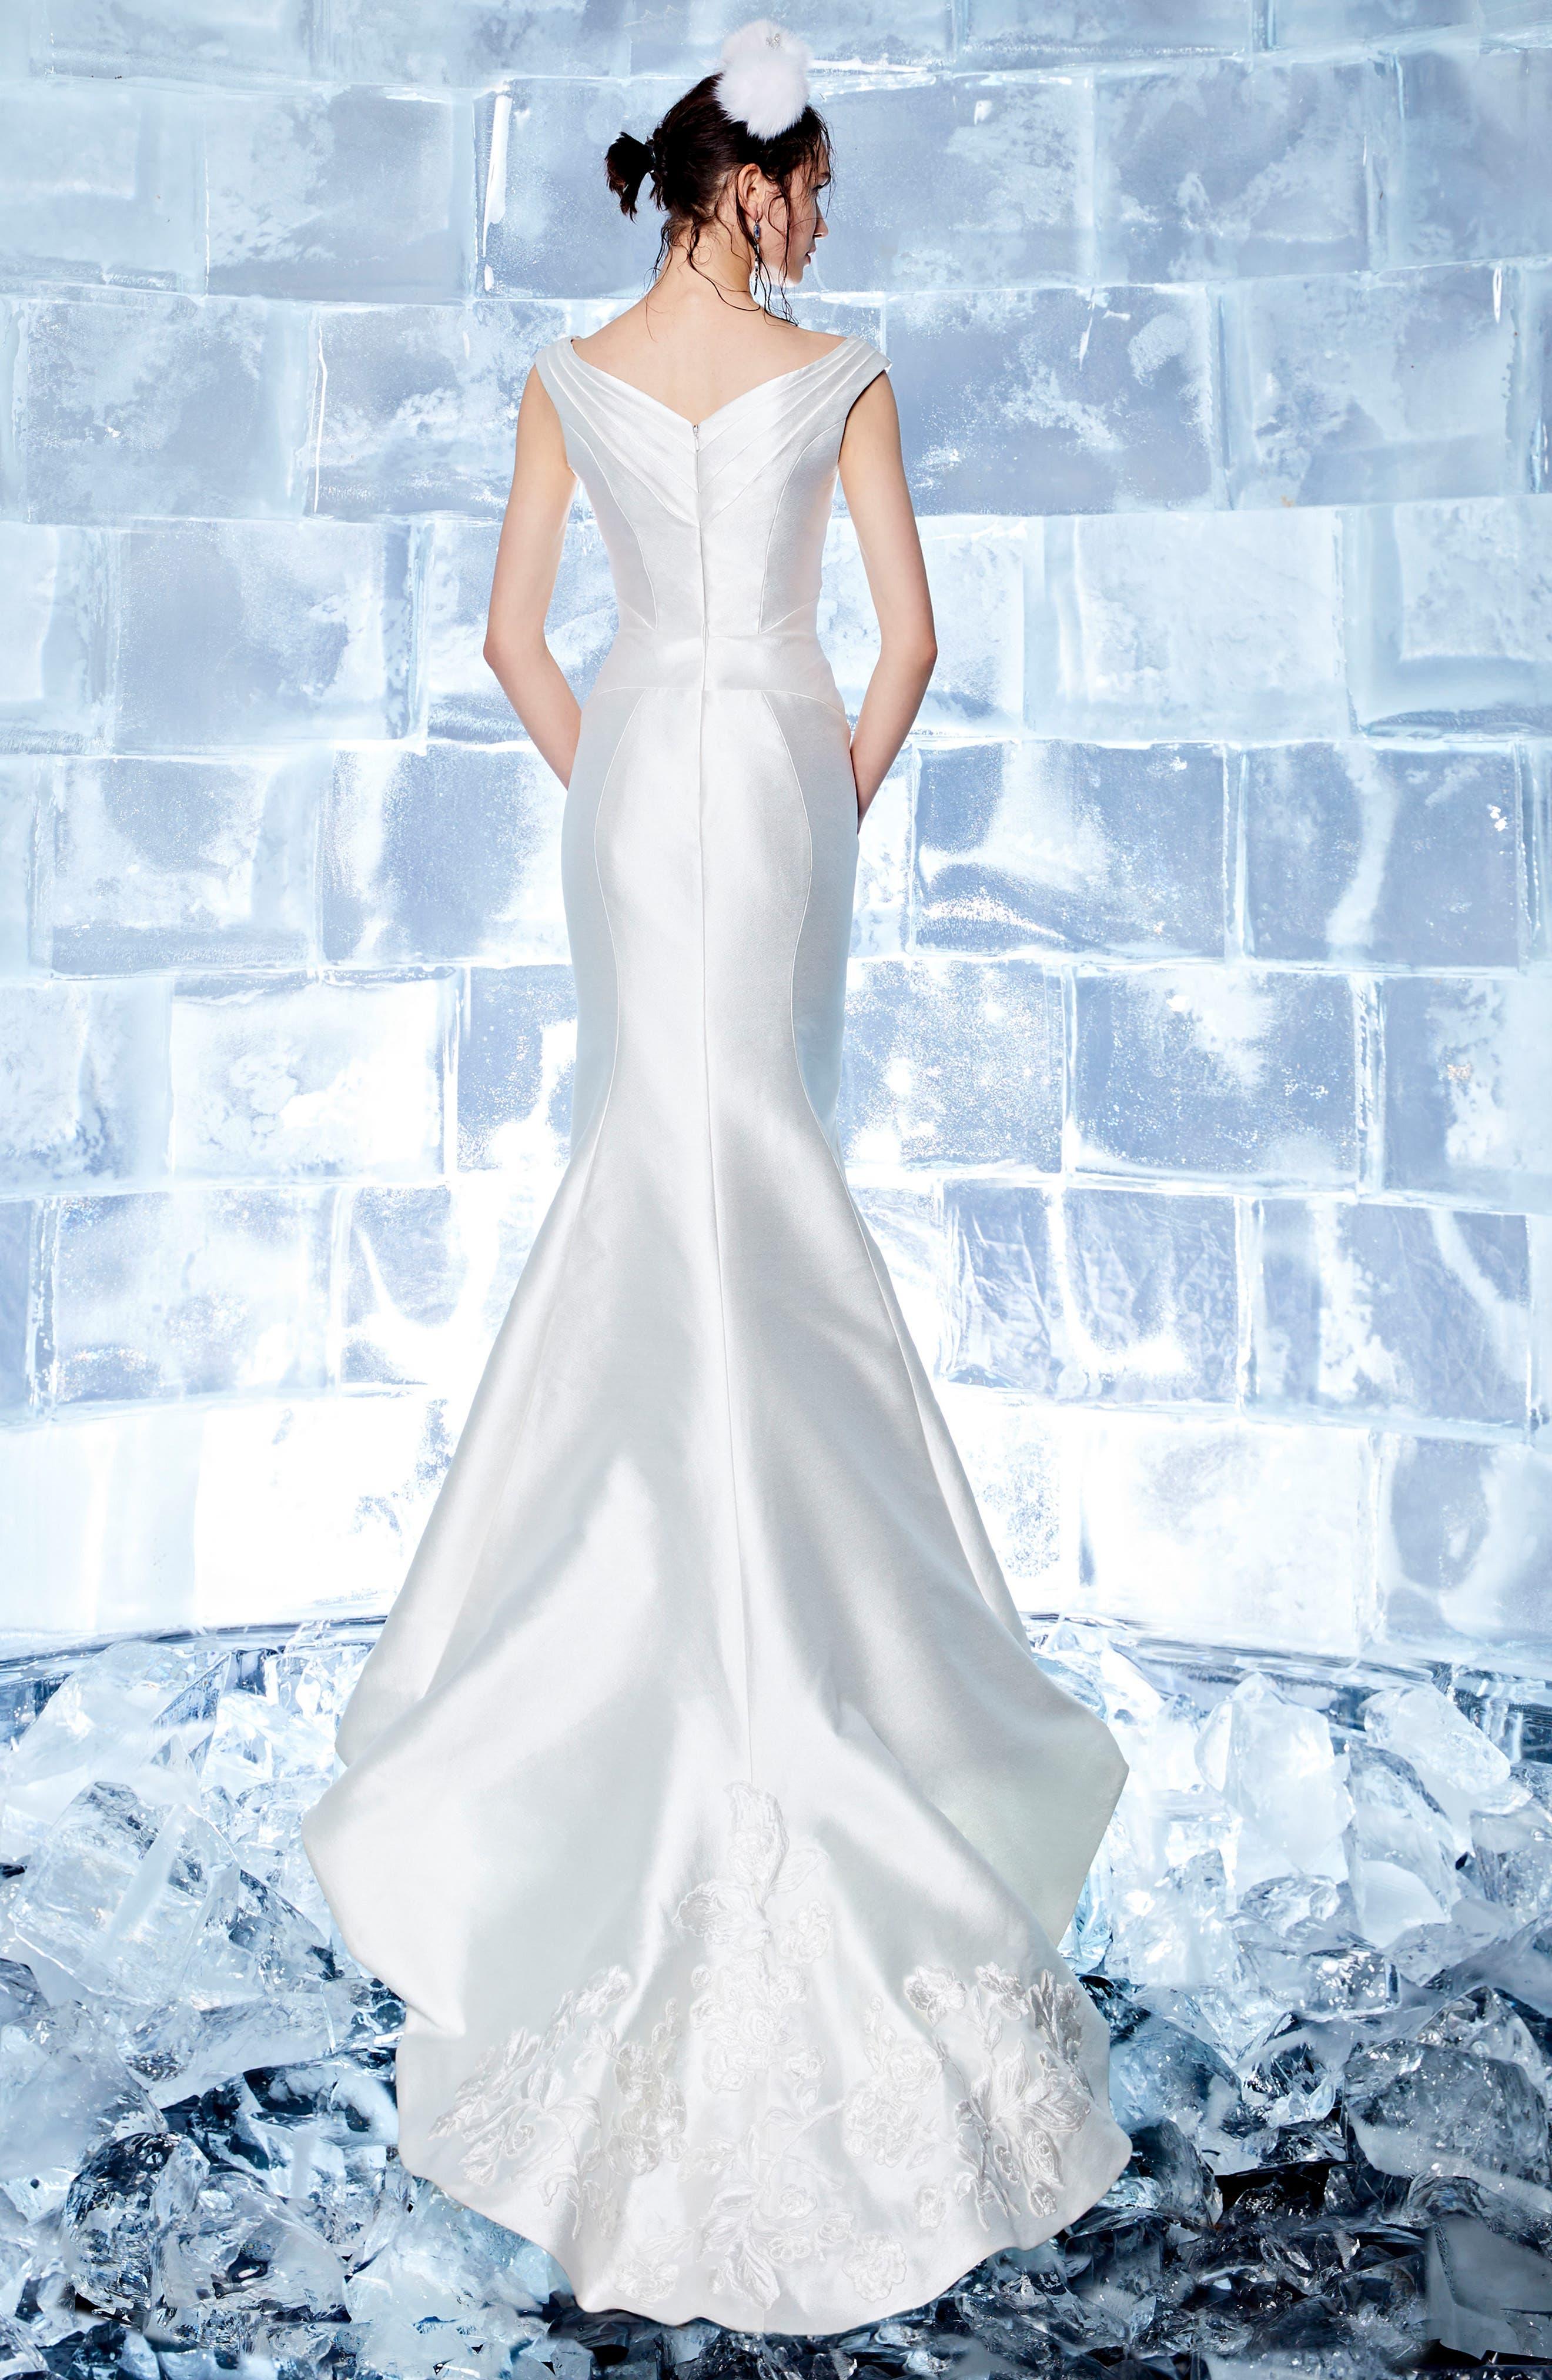 Blanche Duchess Satin Mermaid Gown,                             Alternate thumbnail 2, color,                             900